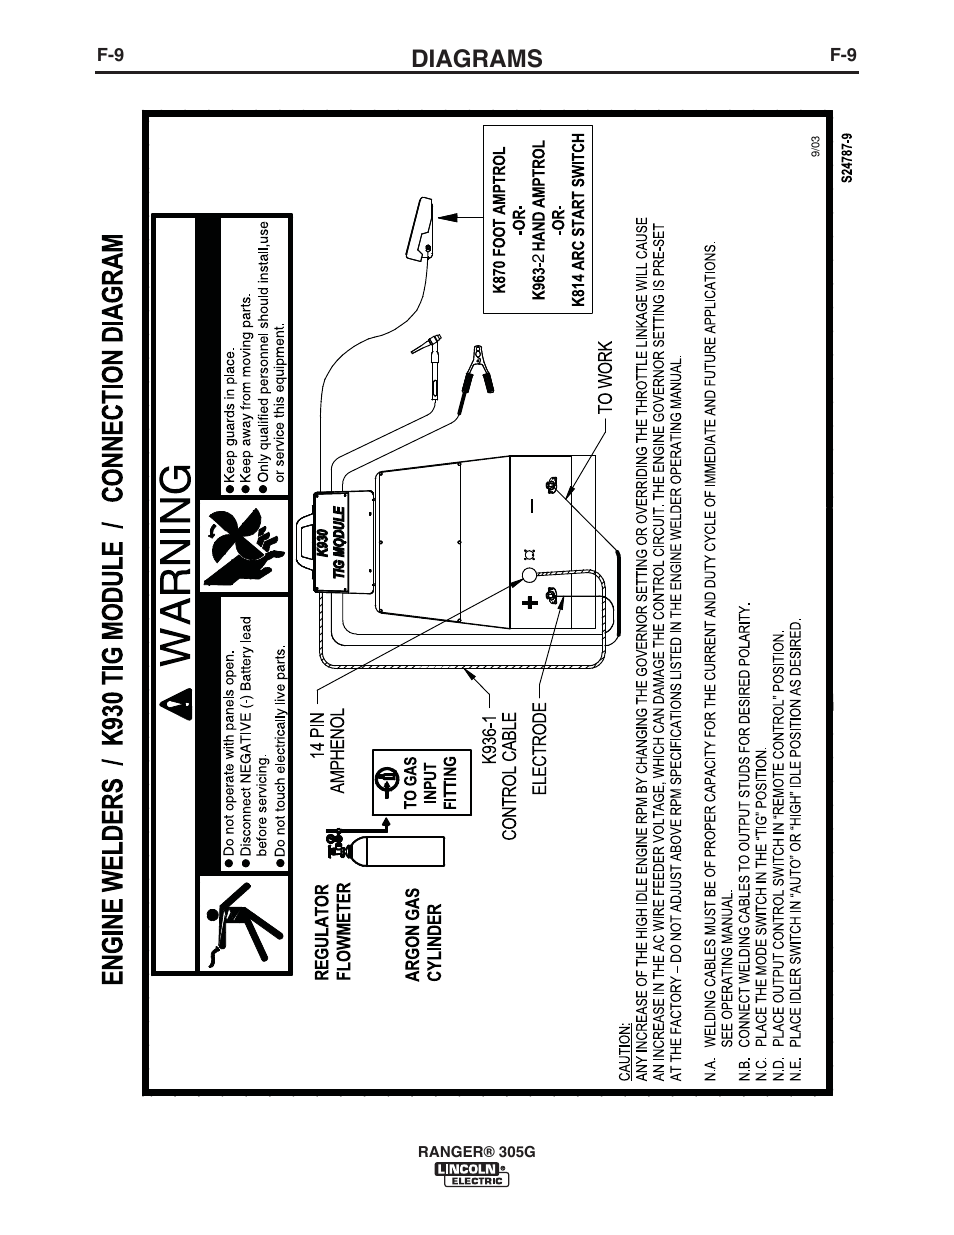 Lincoln Ranger 305d Wiring Diagram : 34 Wiring Diagram